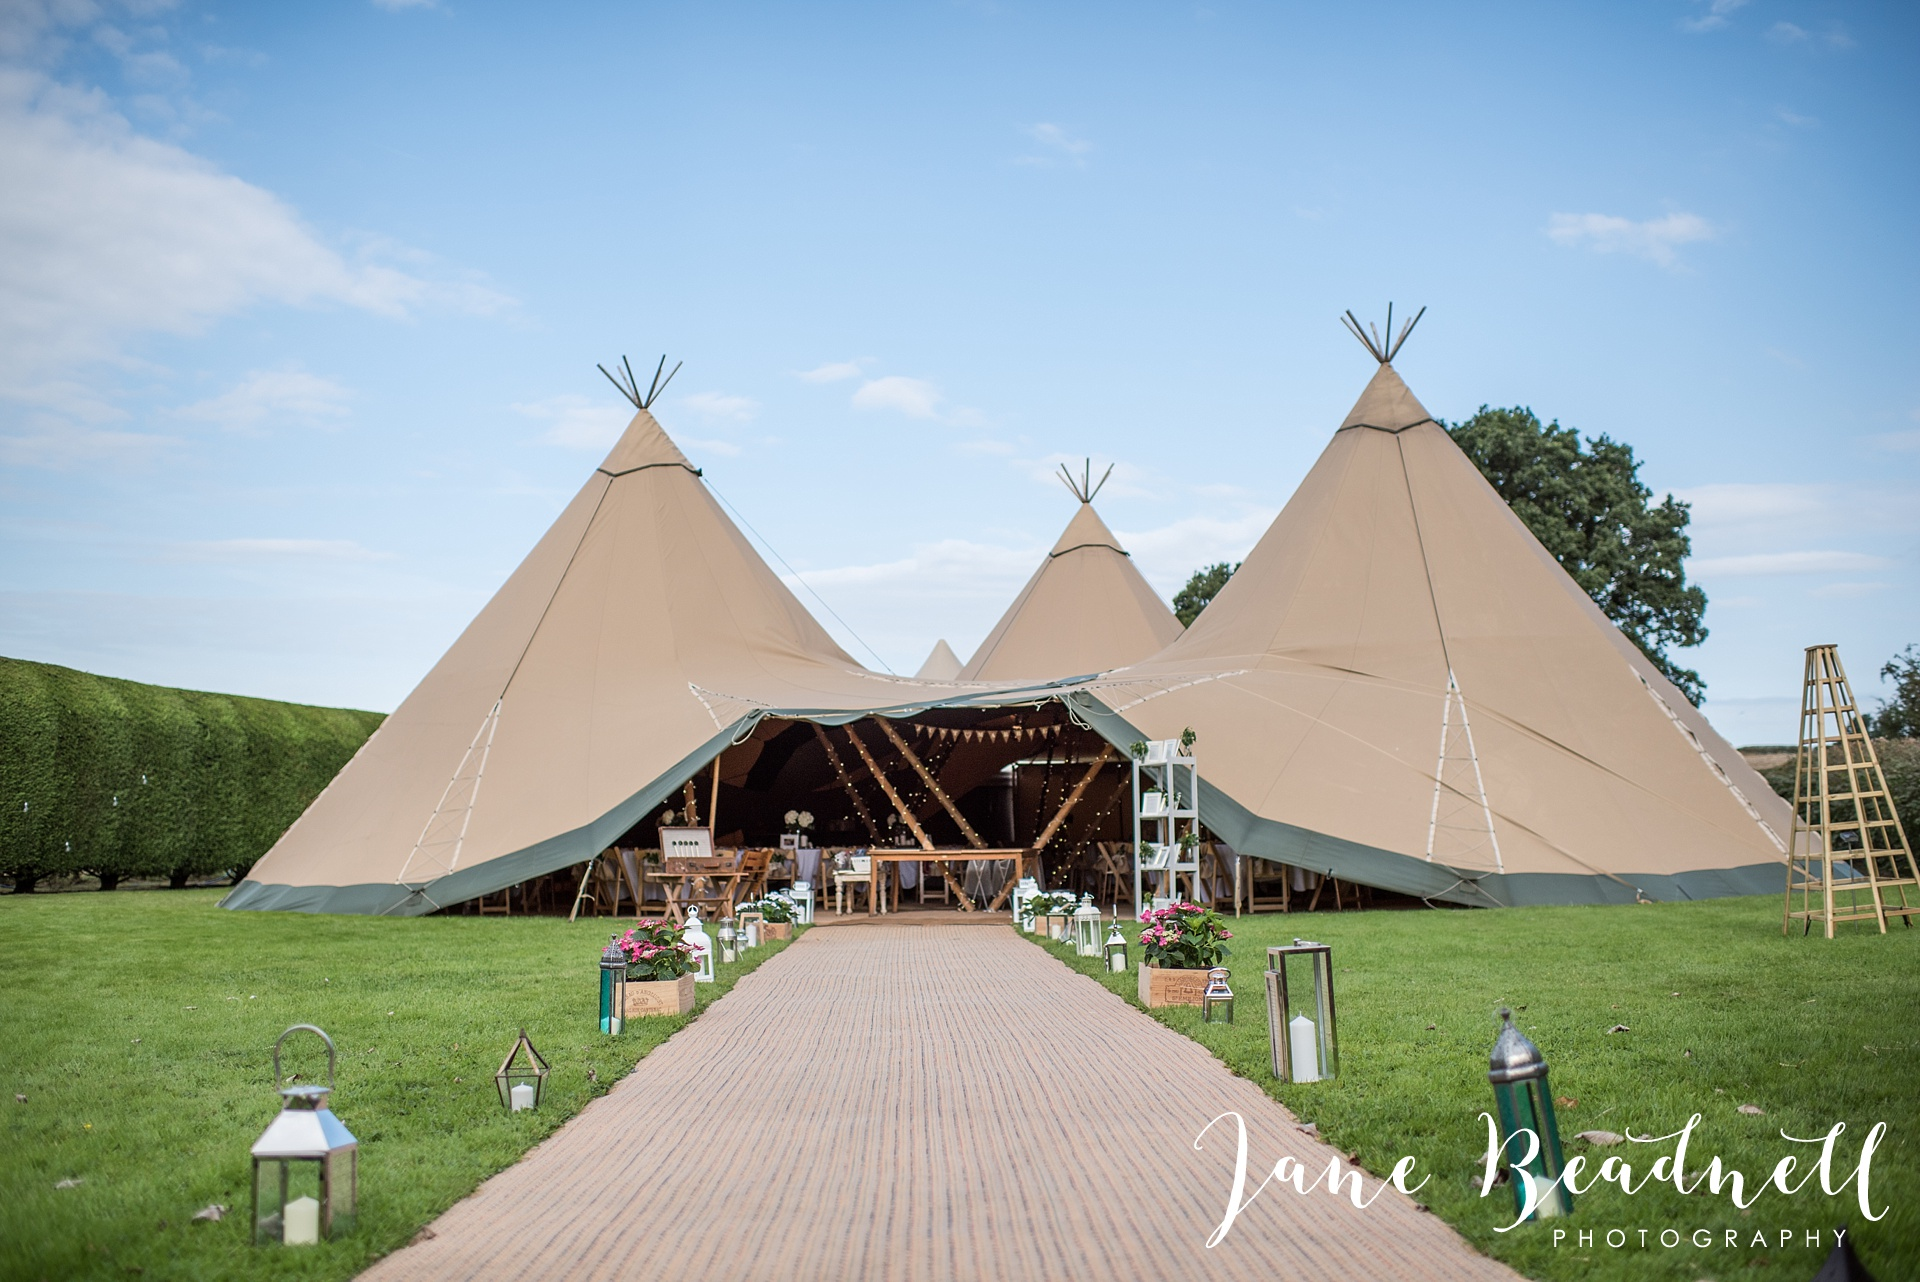 fine-art-wedding-photographer-jane-beadnell-yorkshire-wedding-photographer-garden-wedding_0004